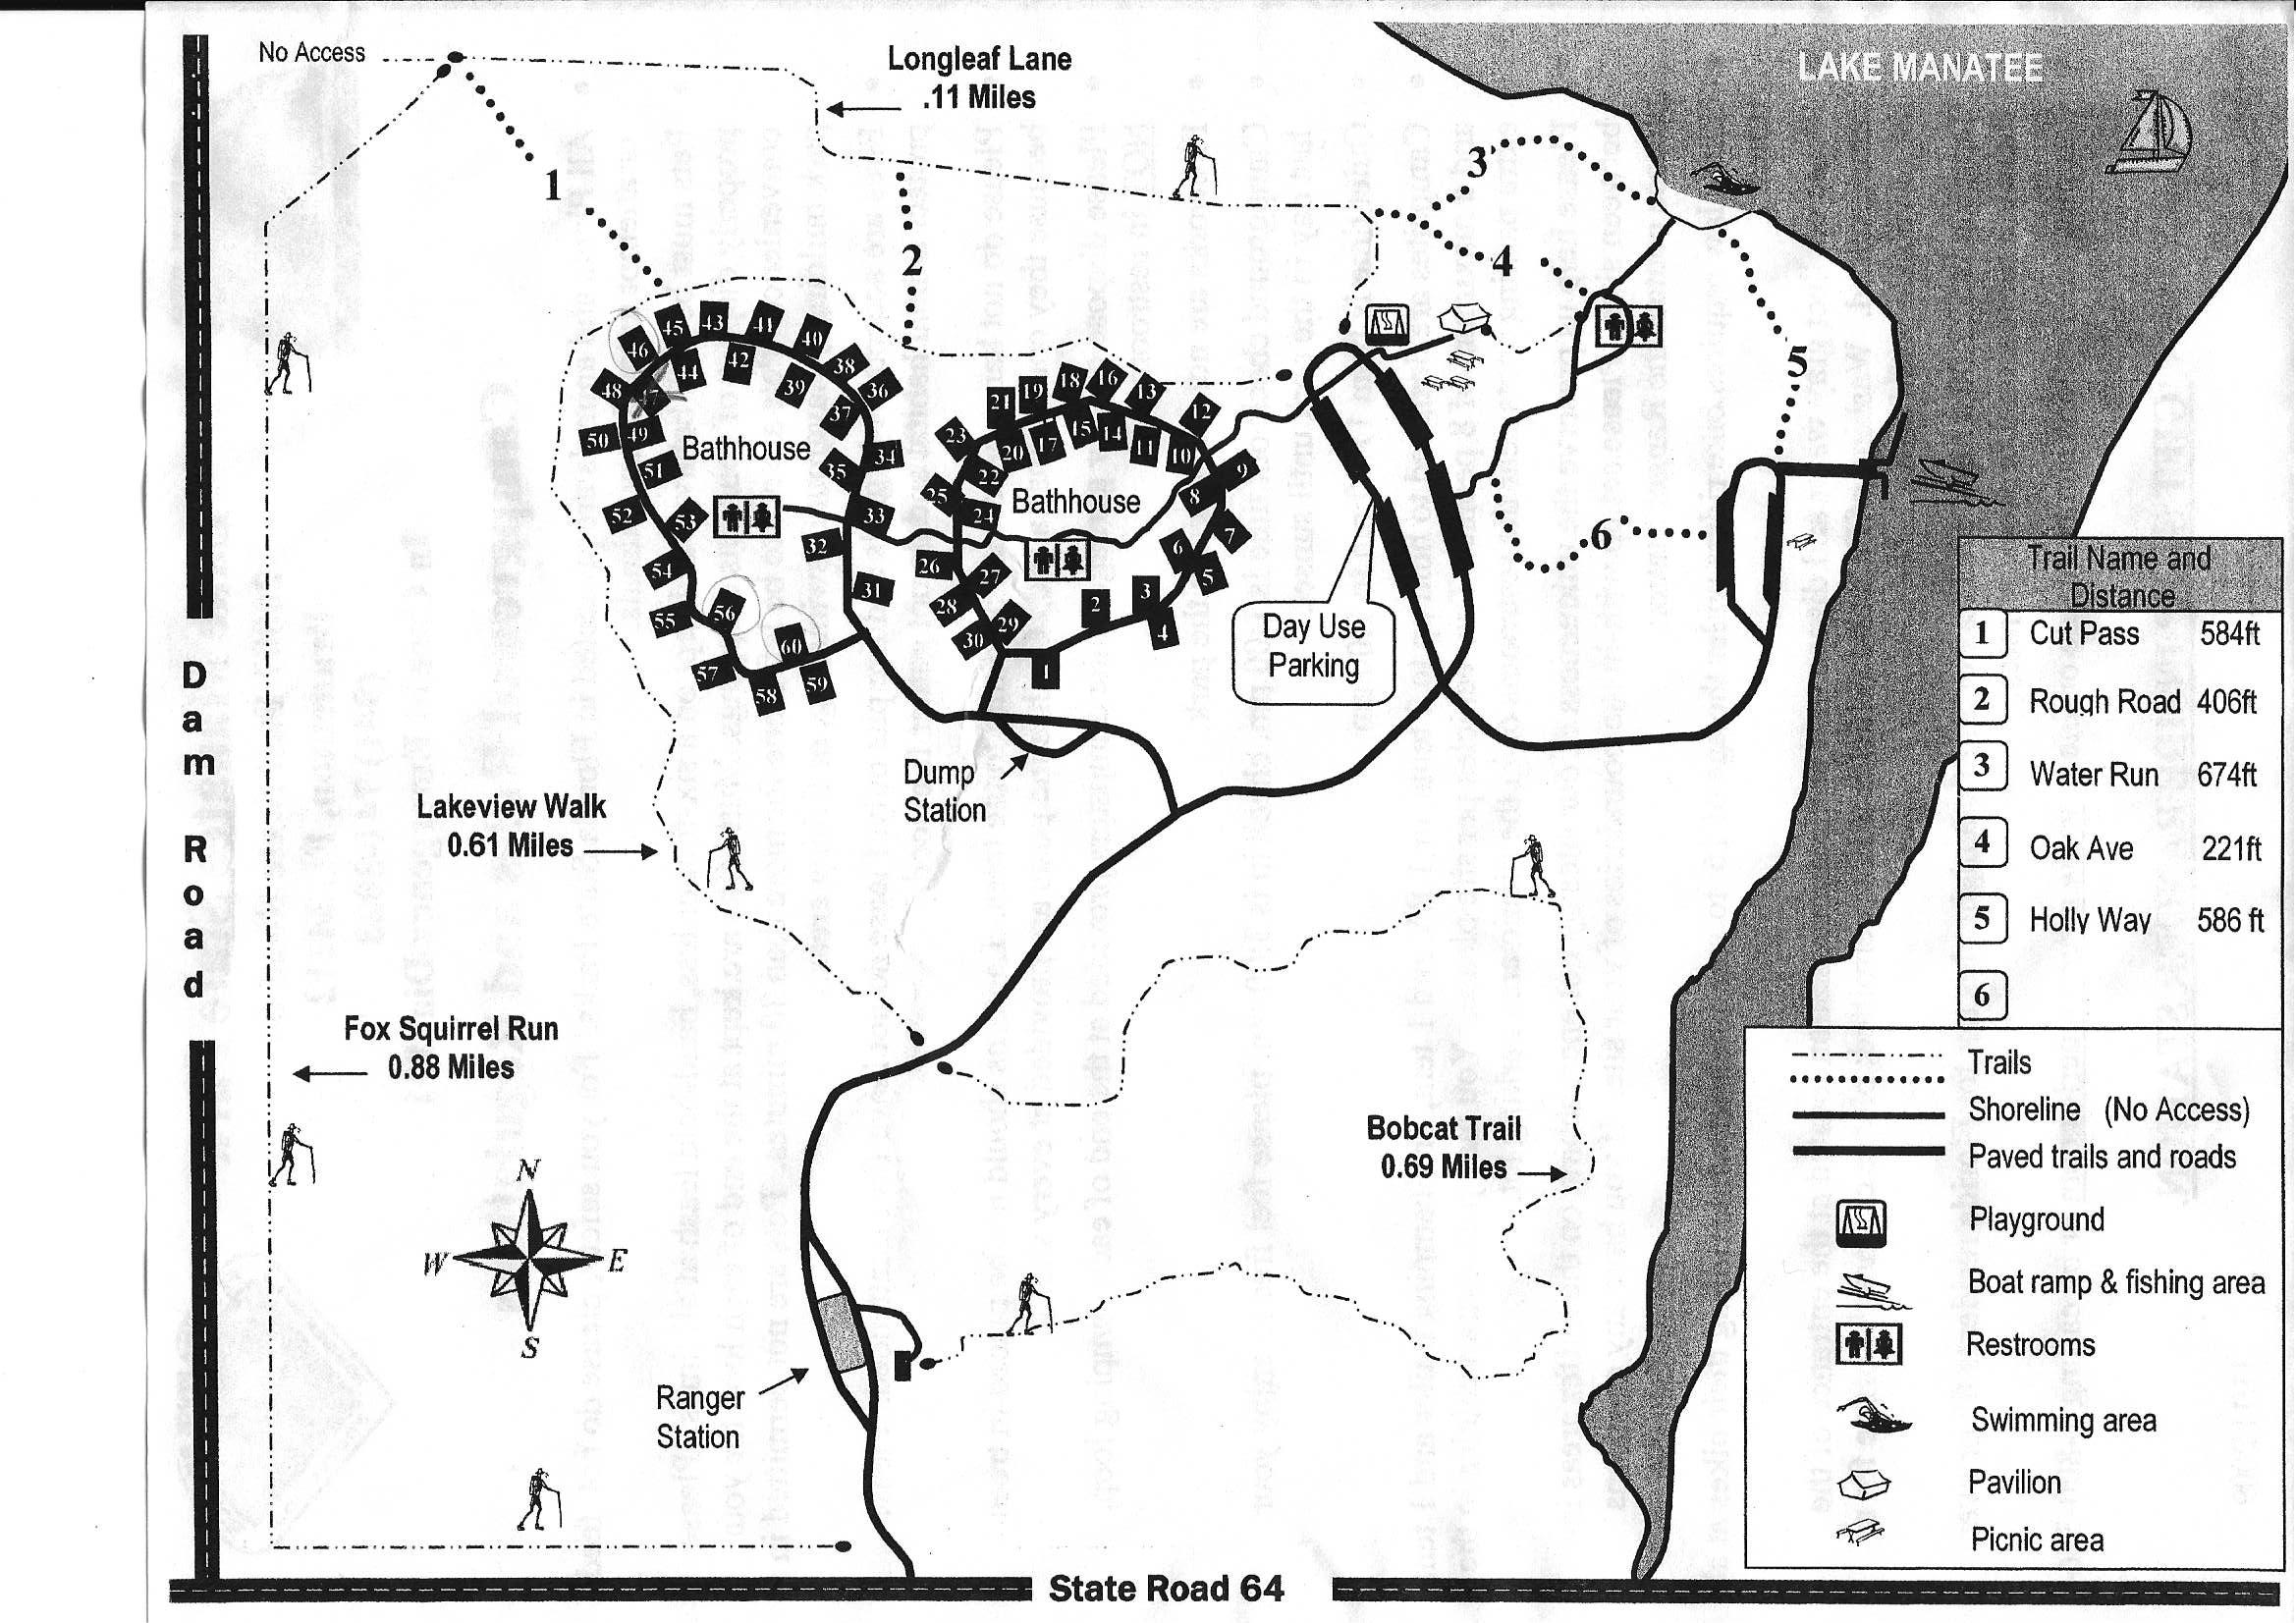 Campground Map Lake Manatee State Park Bradenton Florida - Florida map state parks